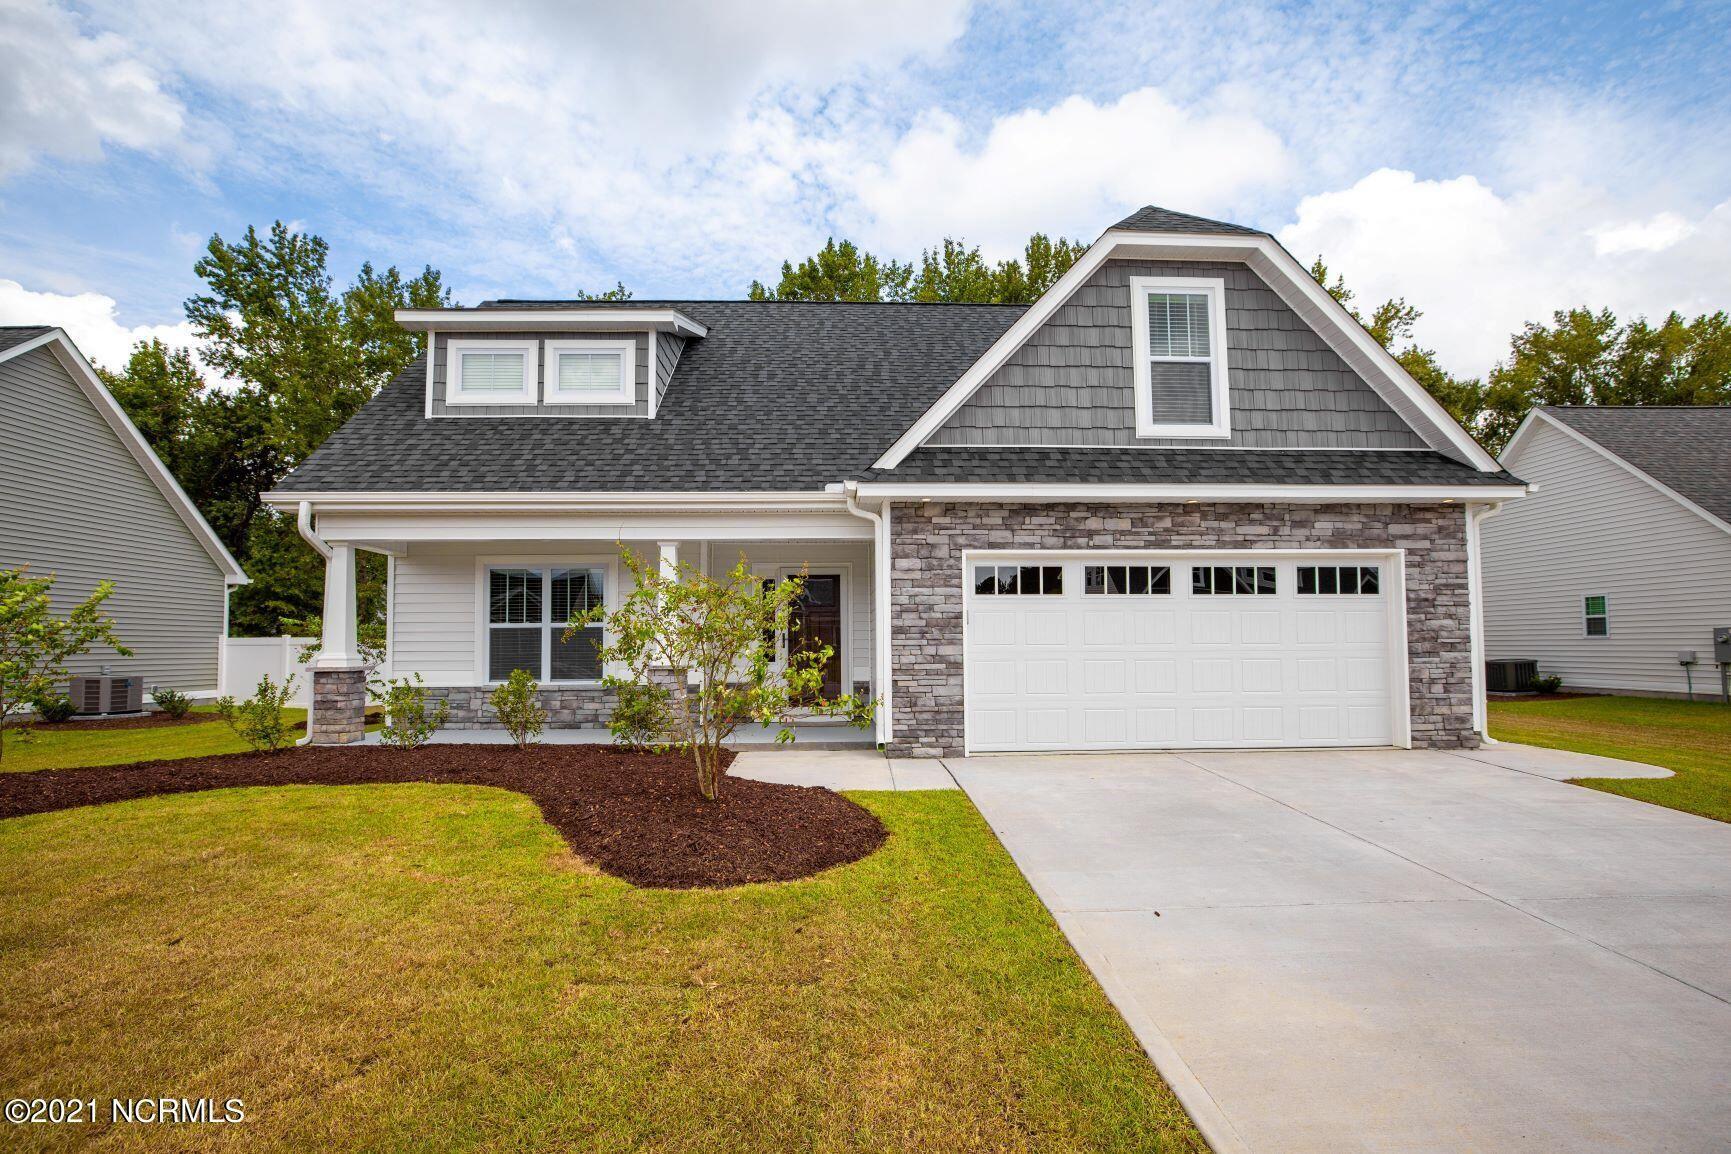 Photo of 3832 East Baywood Lane, Greenville, NC 27834 (MLS # 100280382)